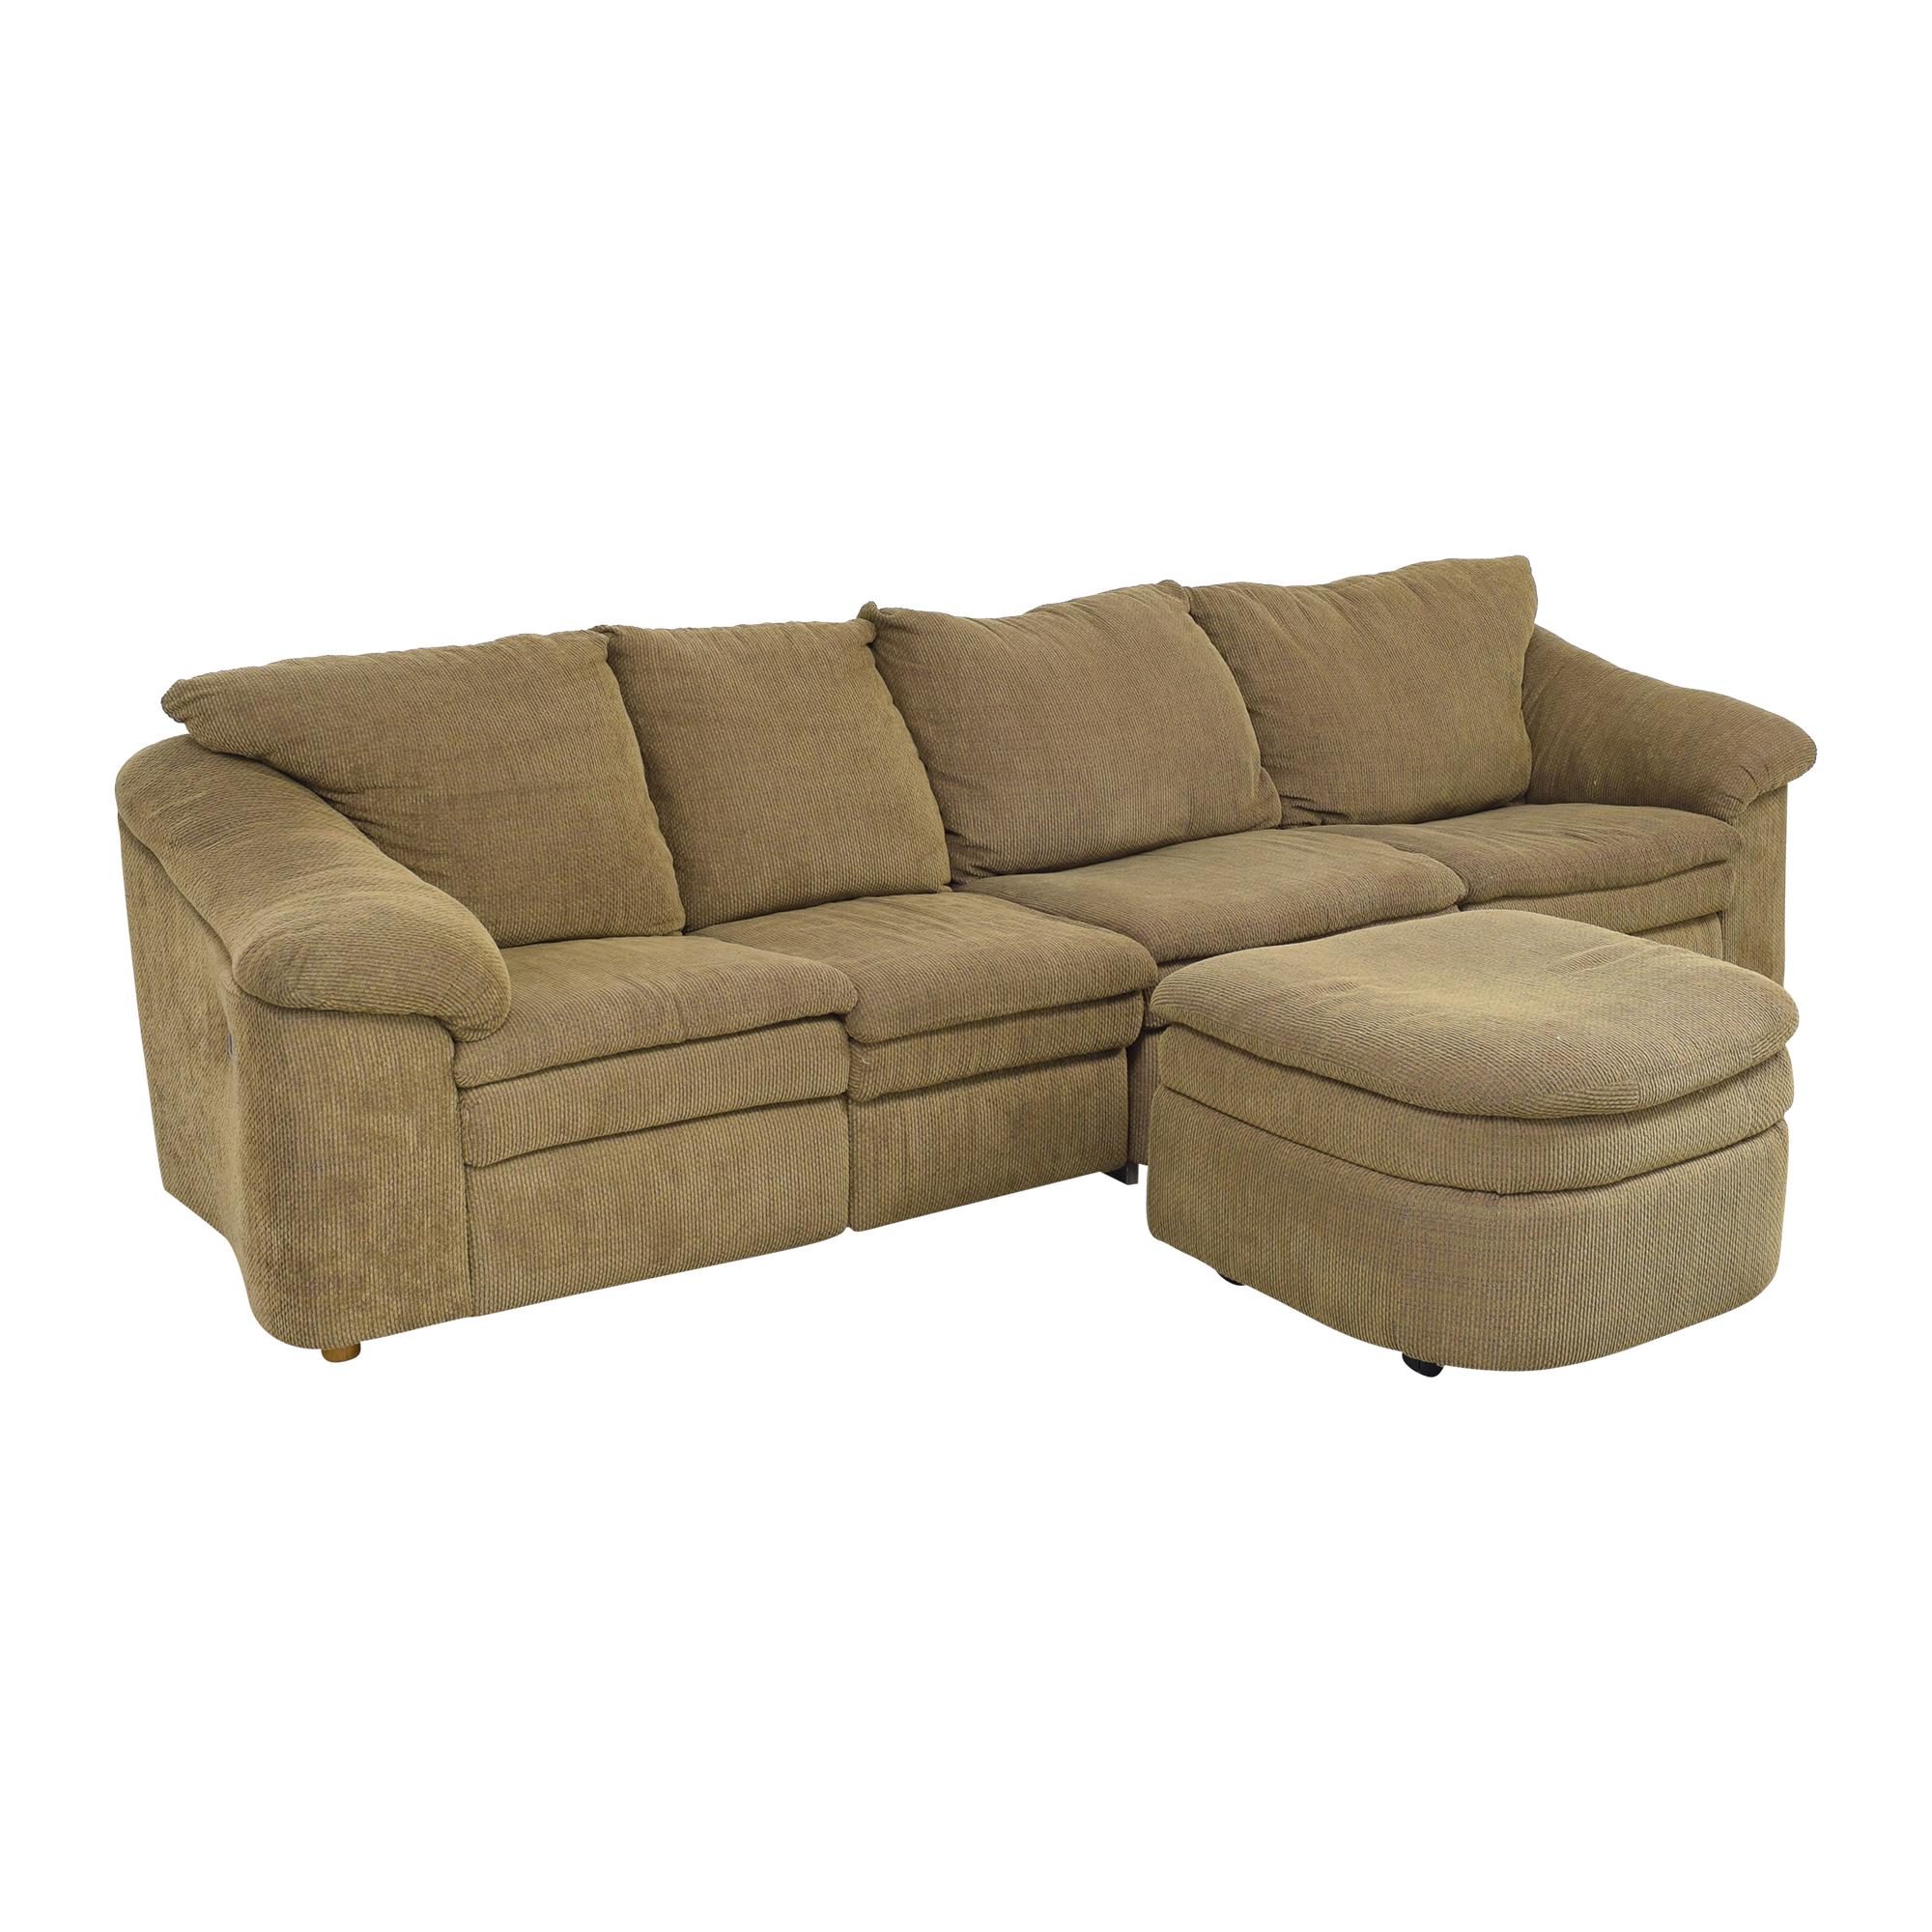 Raymour & Flanigan Raymour & Flanigan Sleeper Sofa with Ottoman on sale